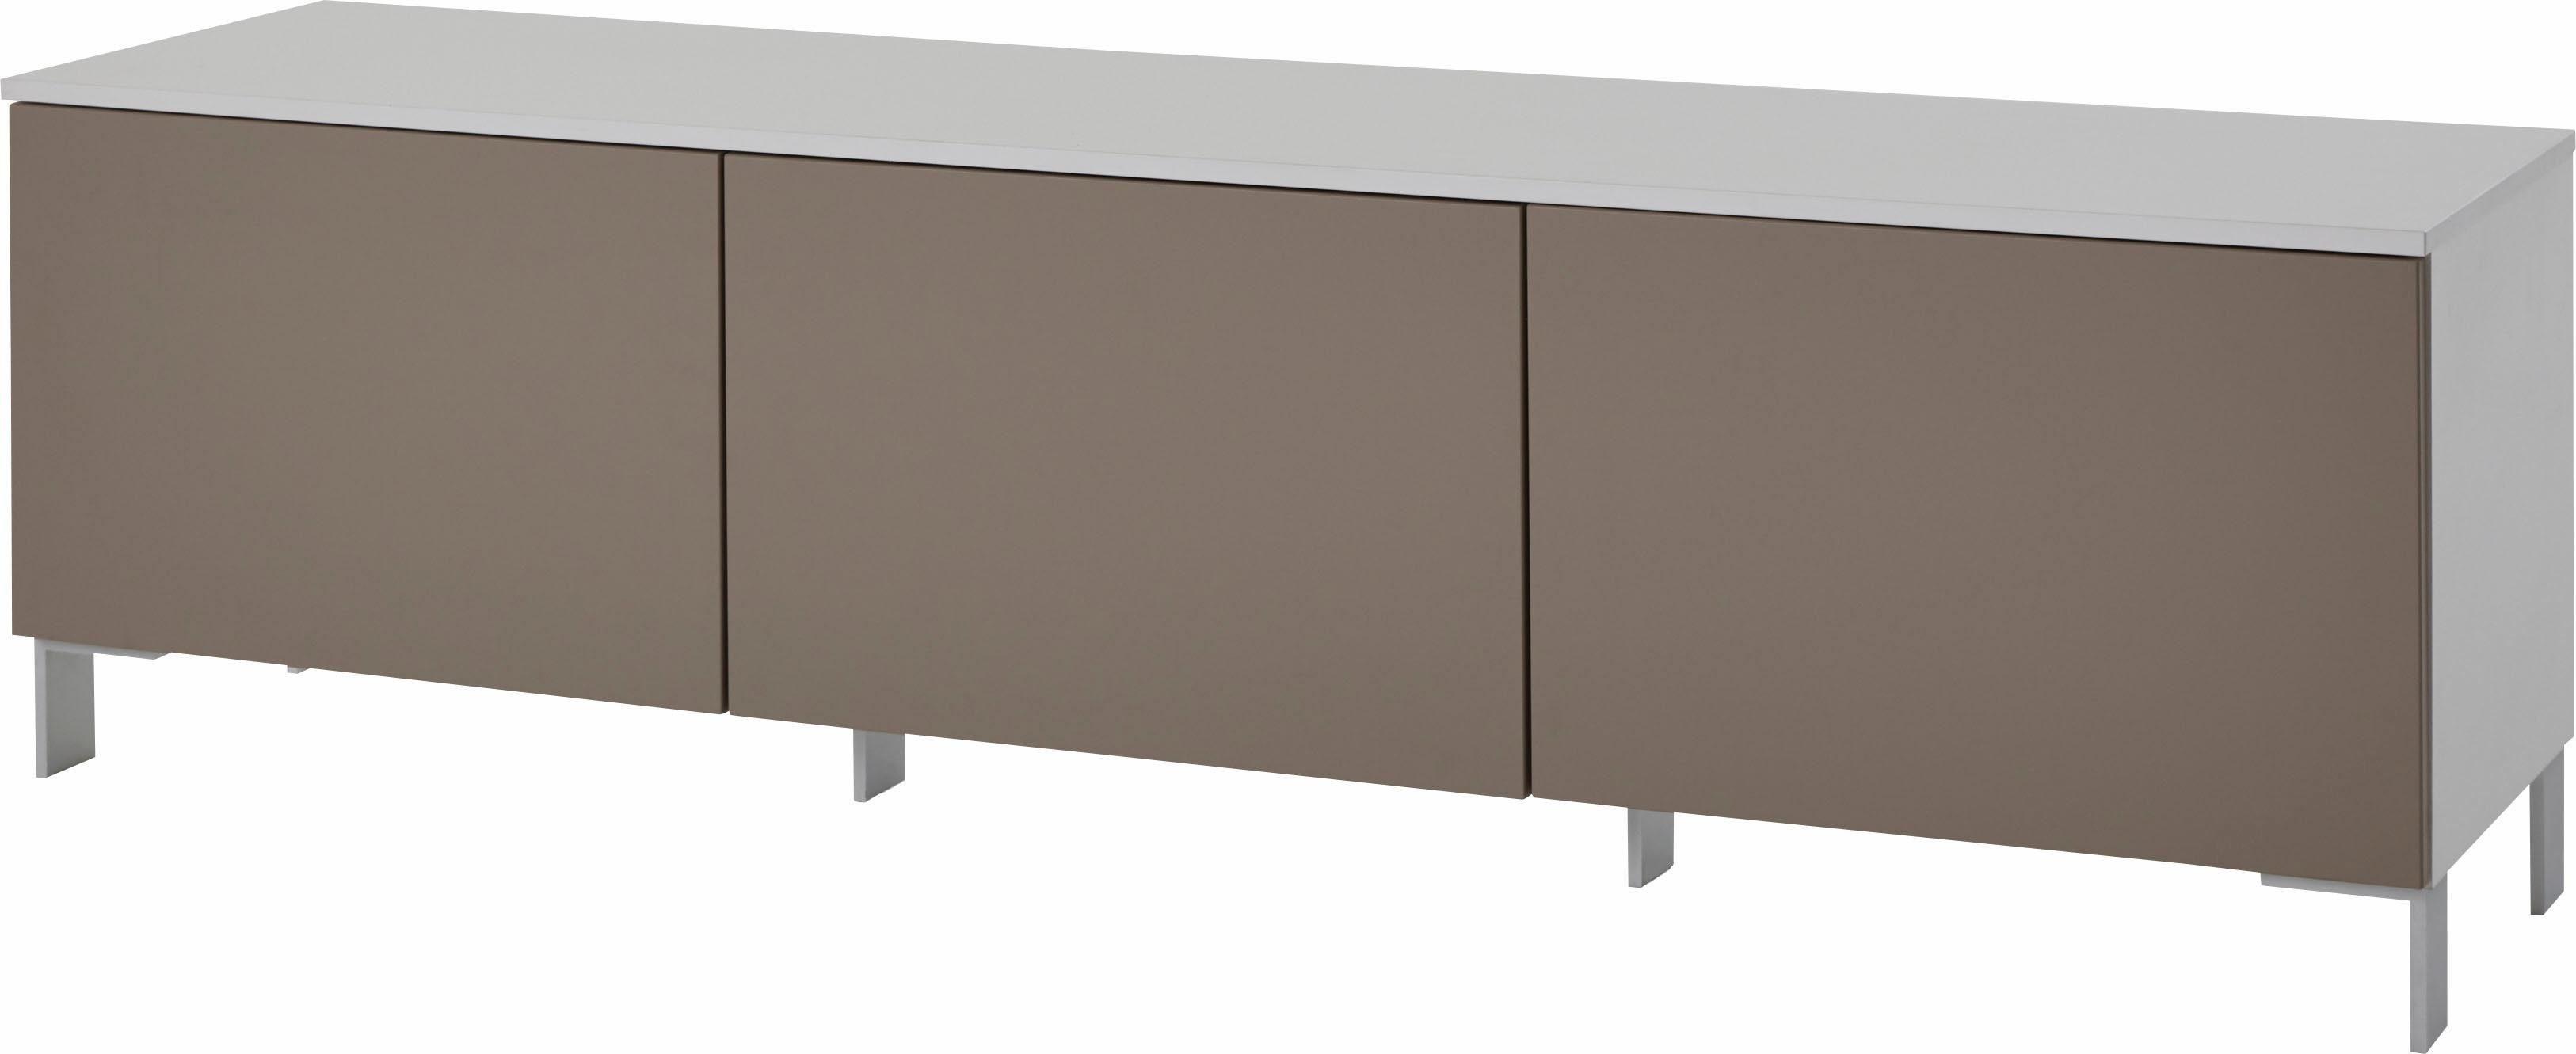 Germania Lowboard »Nivala«, Breite 170 cm